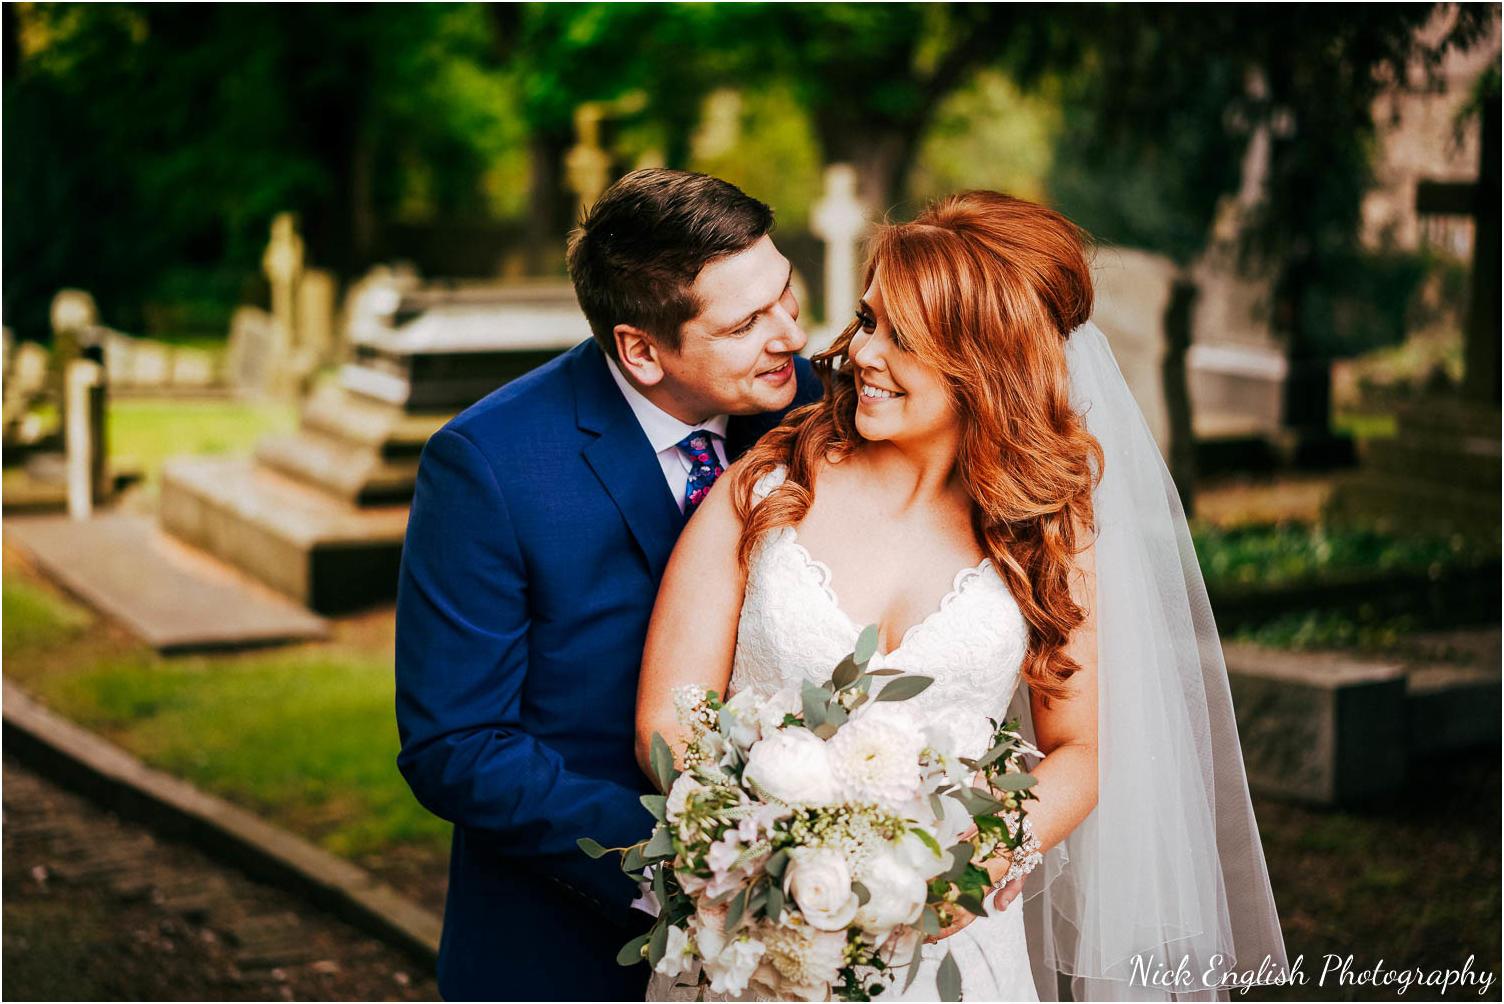 Mitton_Hall_Wedding_Photographer-86.jpg